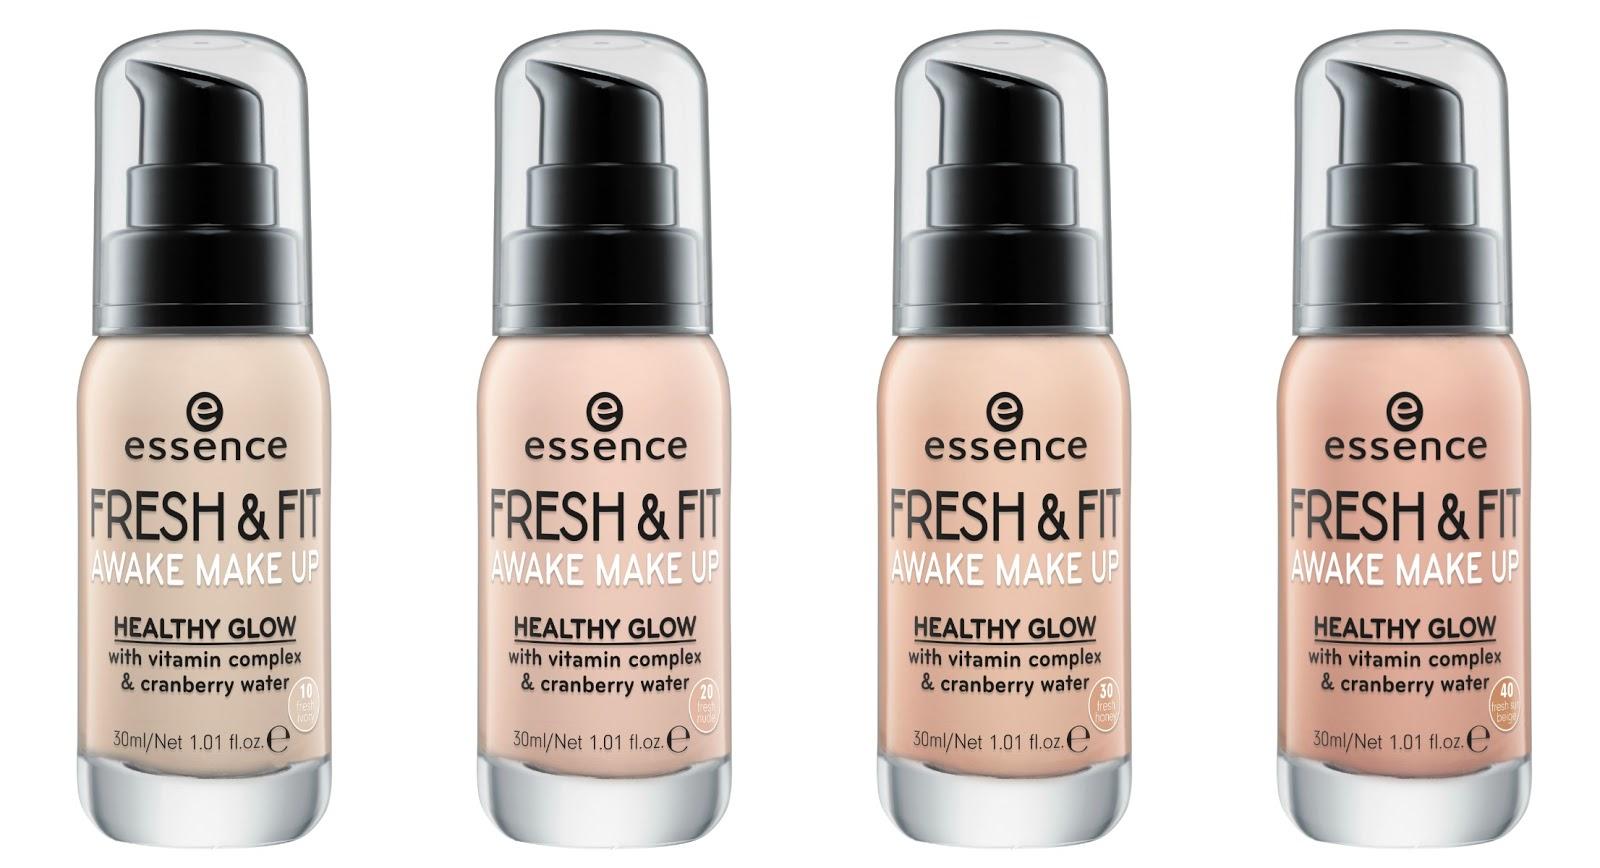 Essence Fresh & Fit Awake Make Up